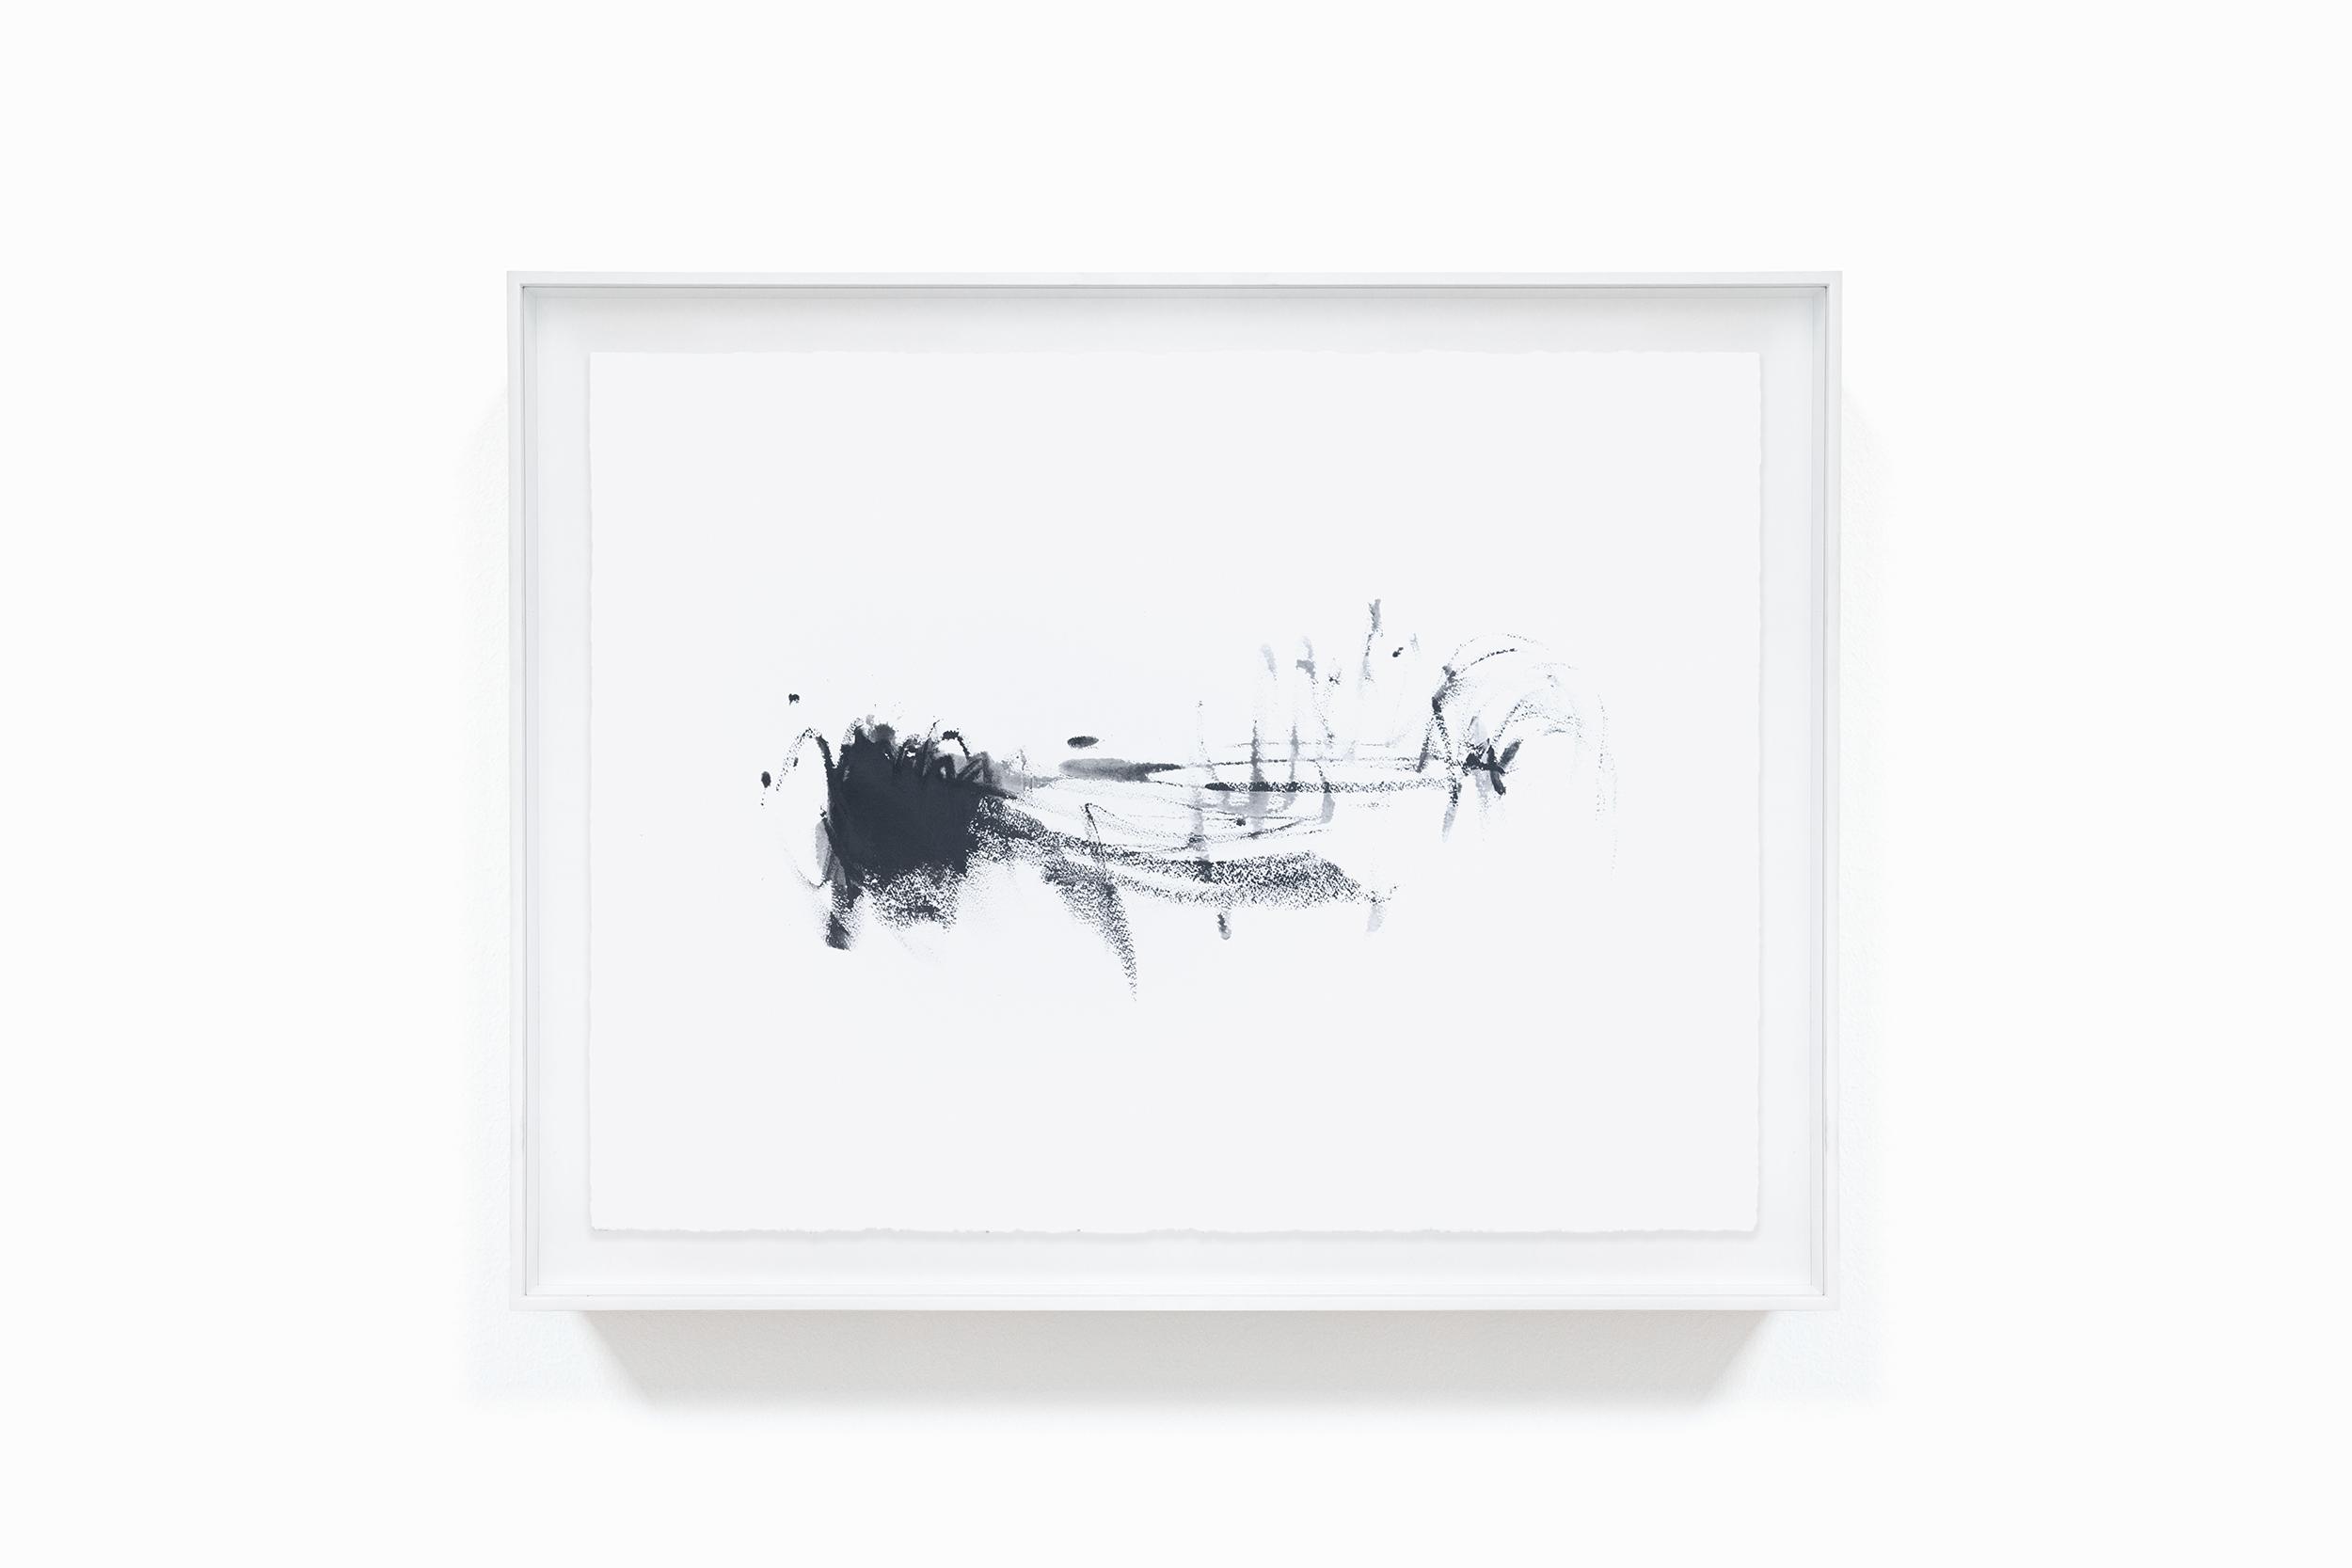 097 Andre Gigante Pintura Painting bonjourmolotov La.jpg